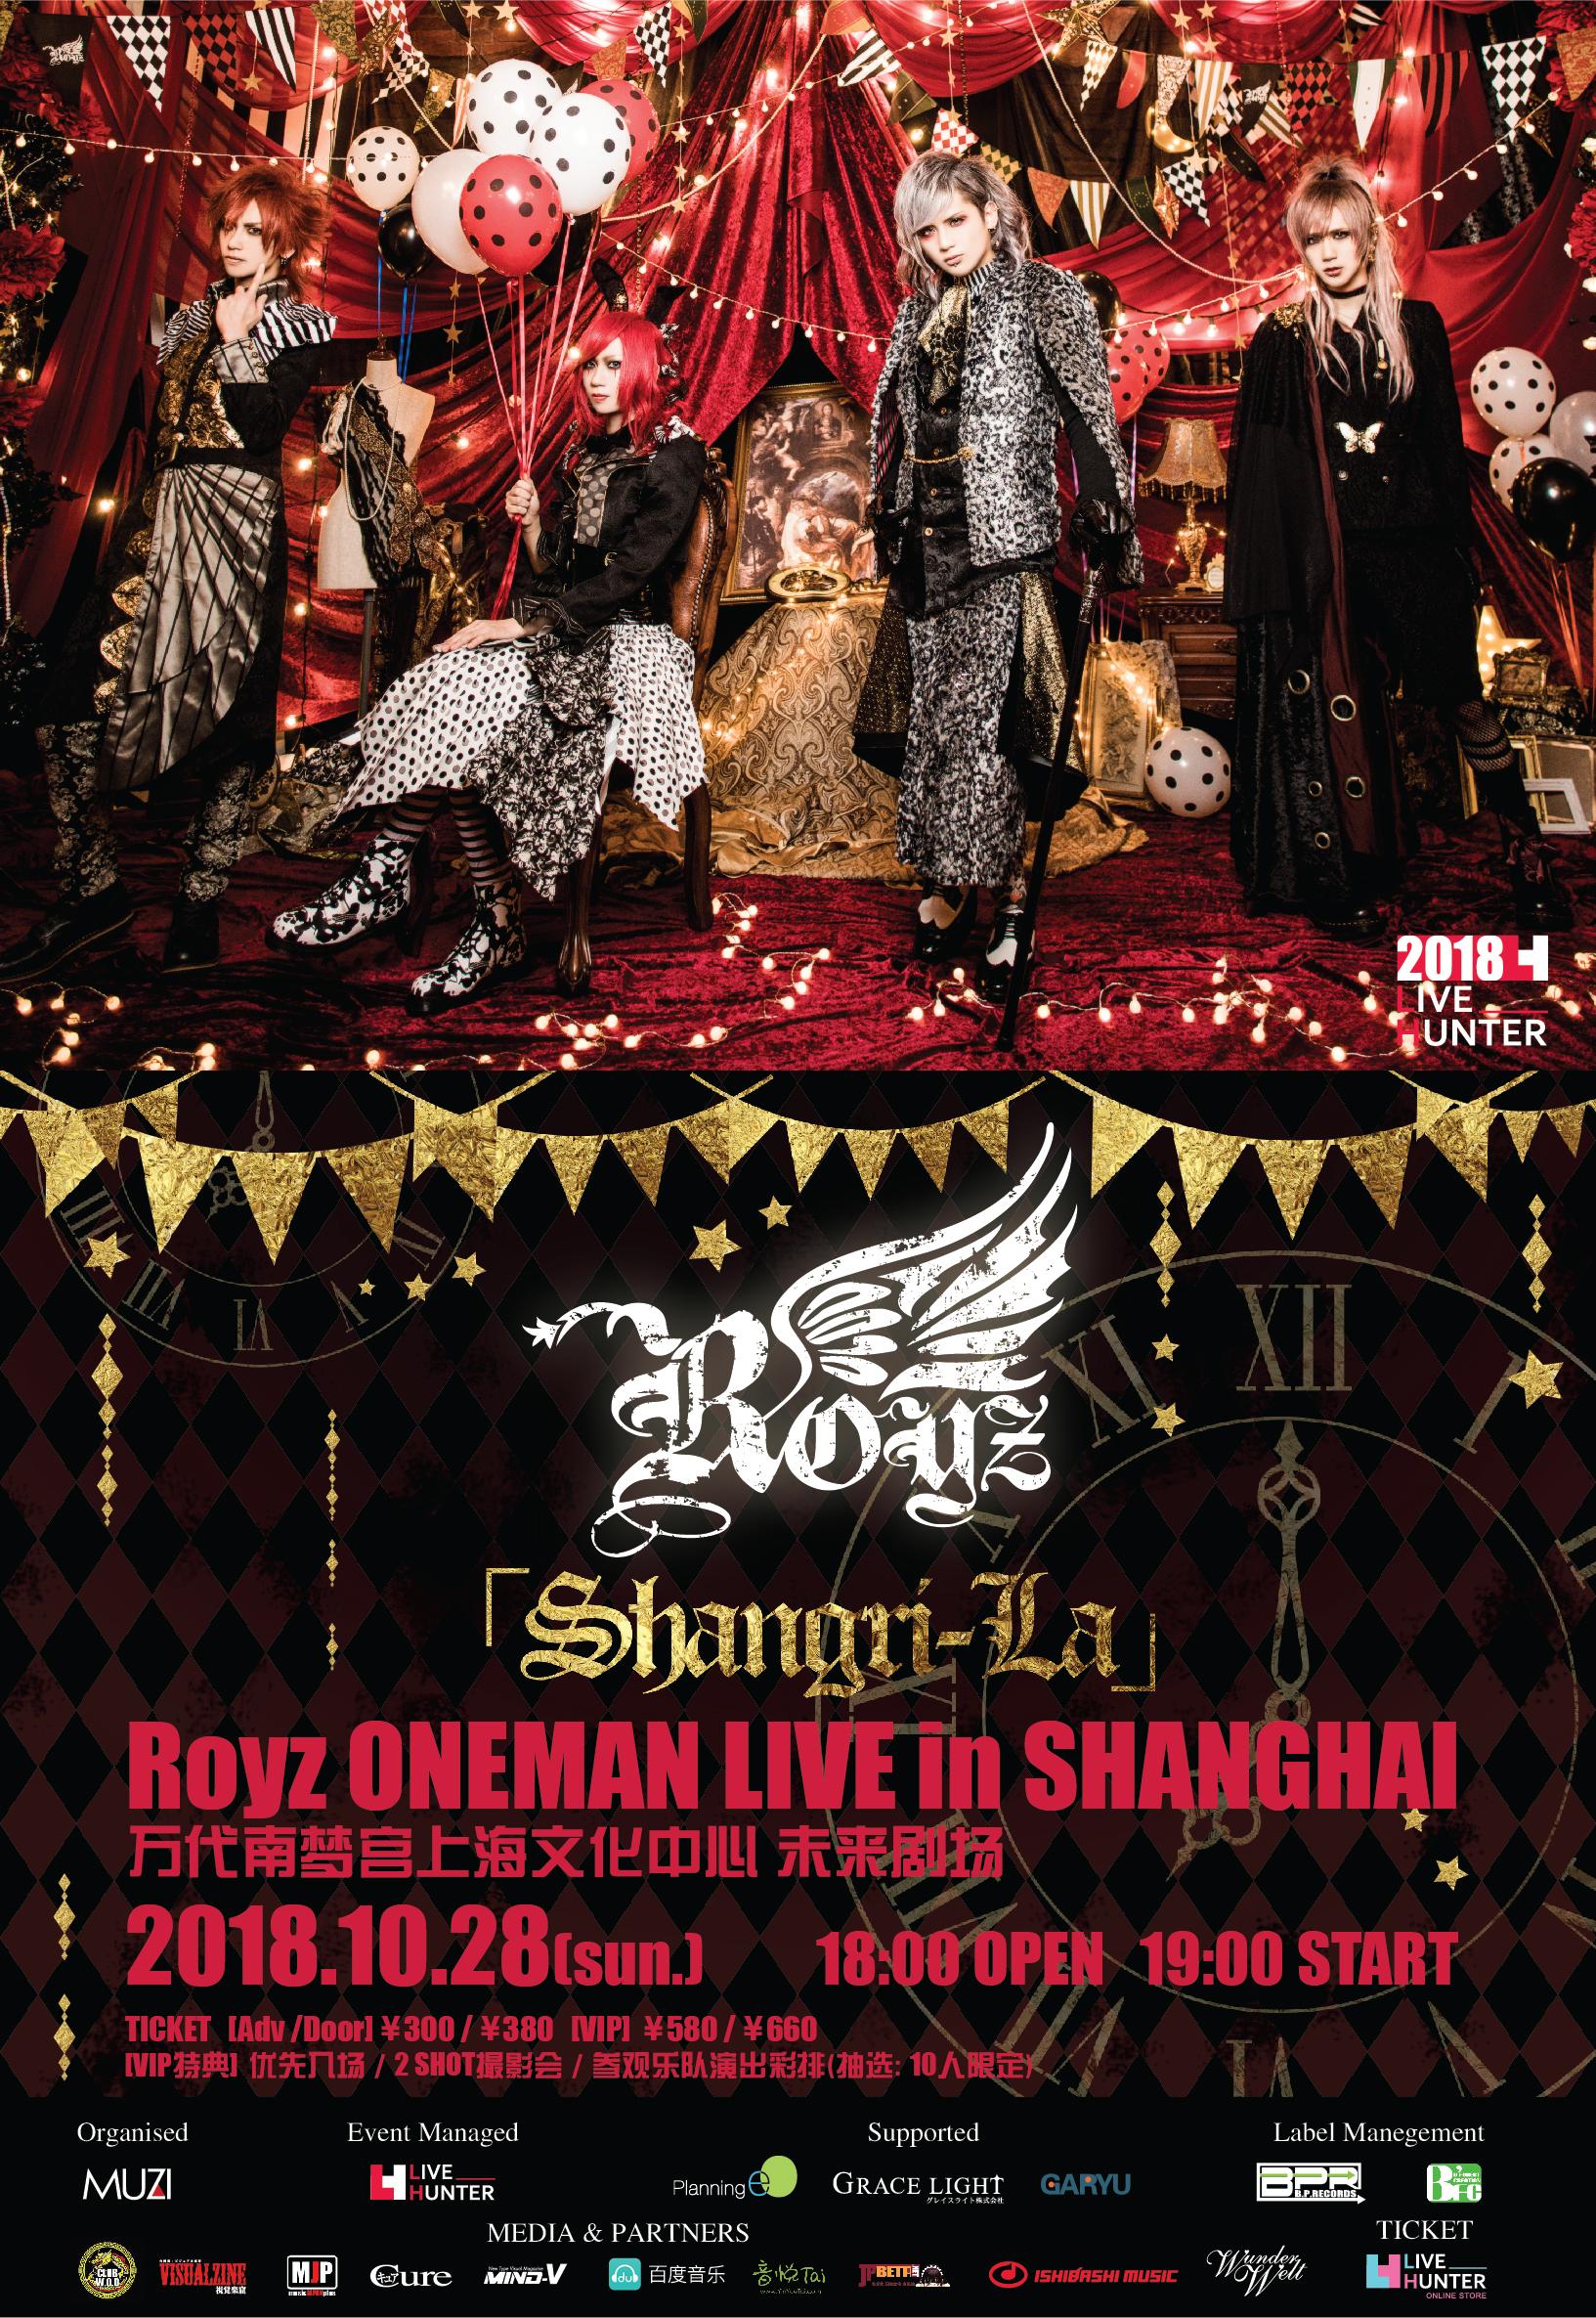 Royz ONEMAN LIVE in SHANGHAI 「Shangr